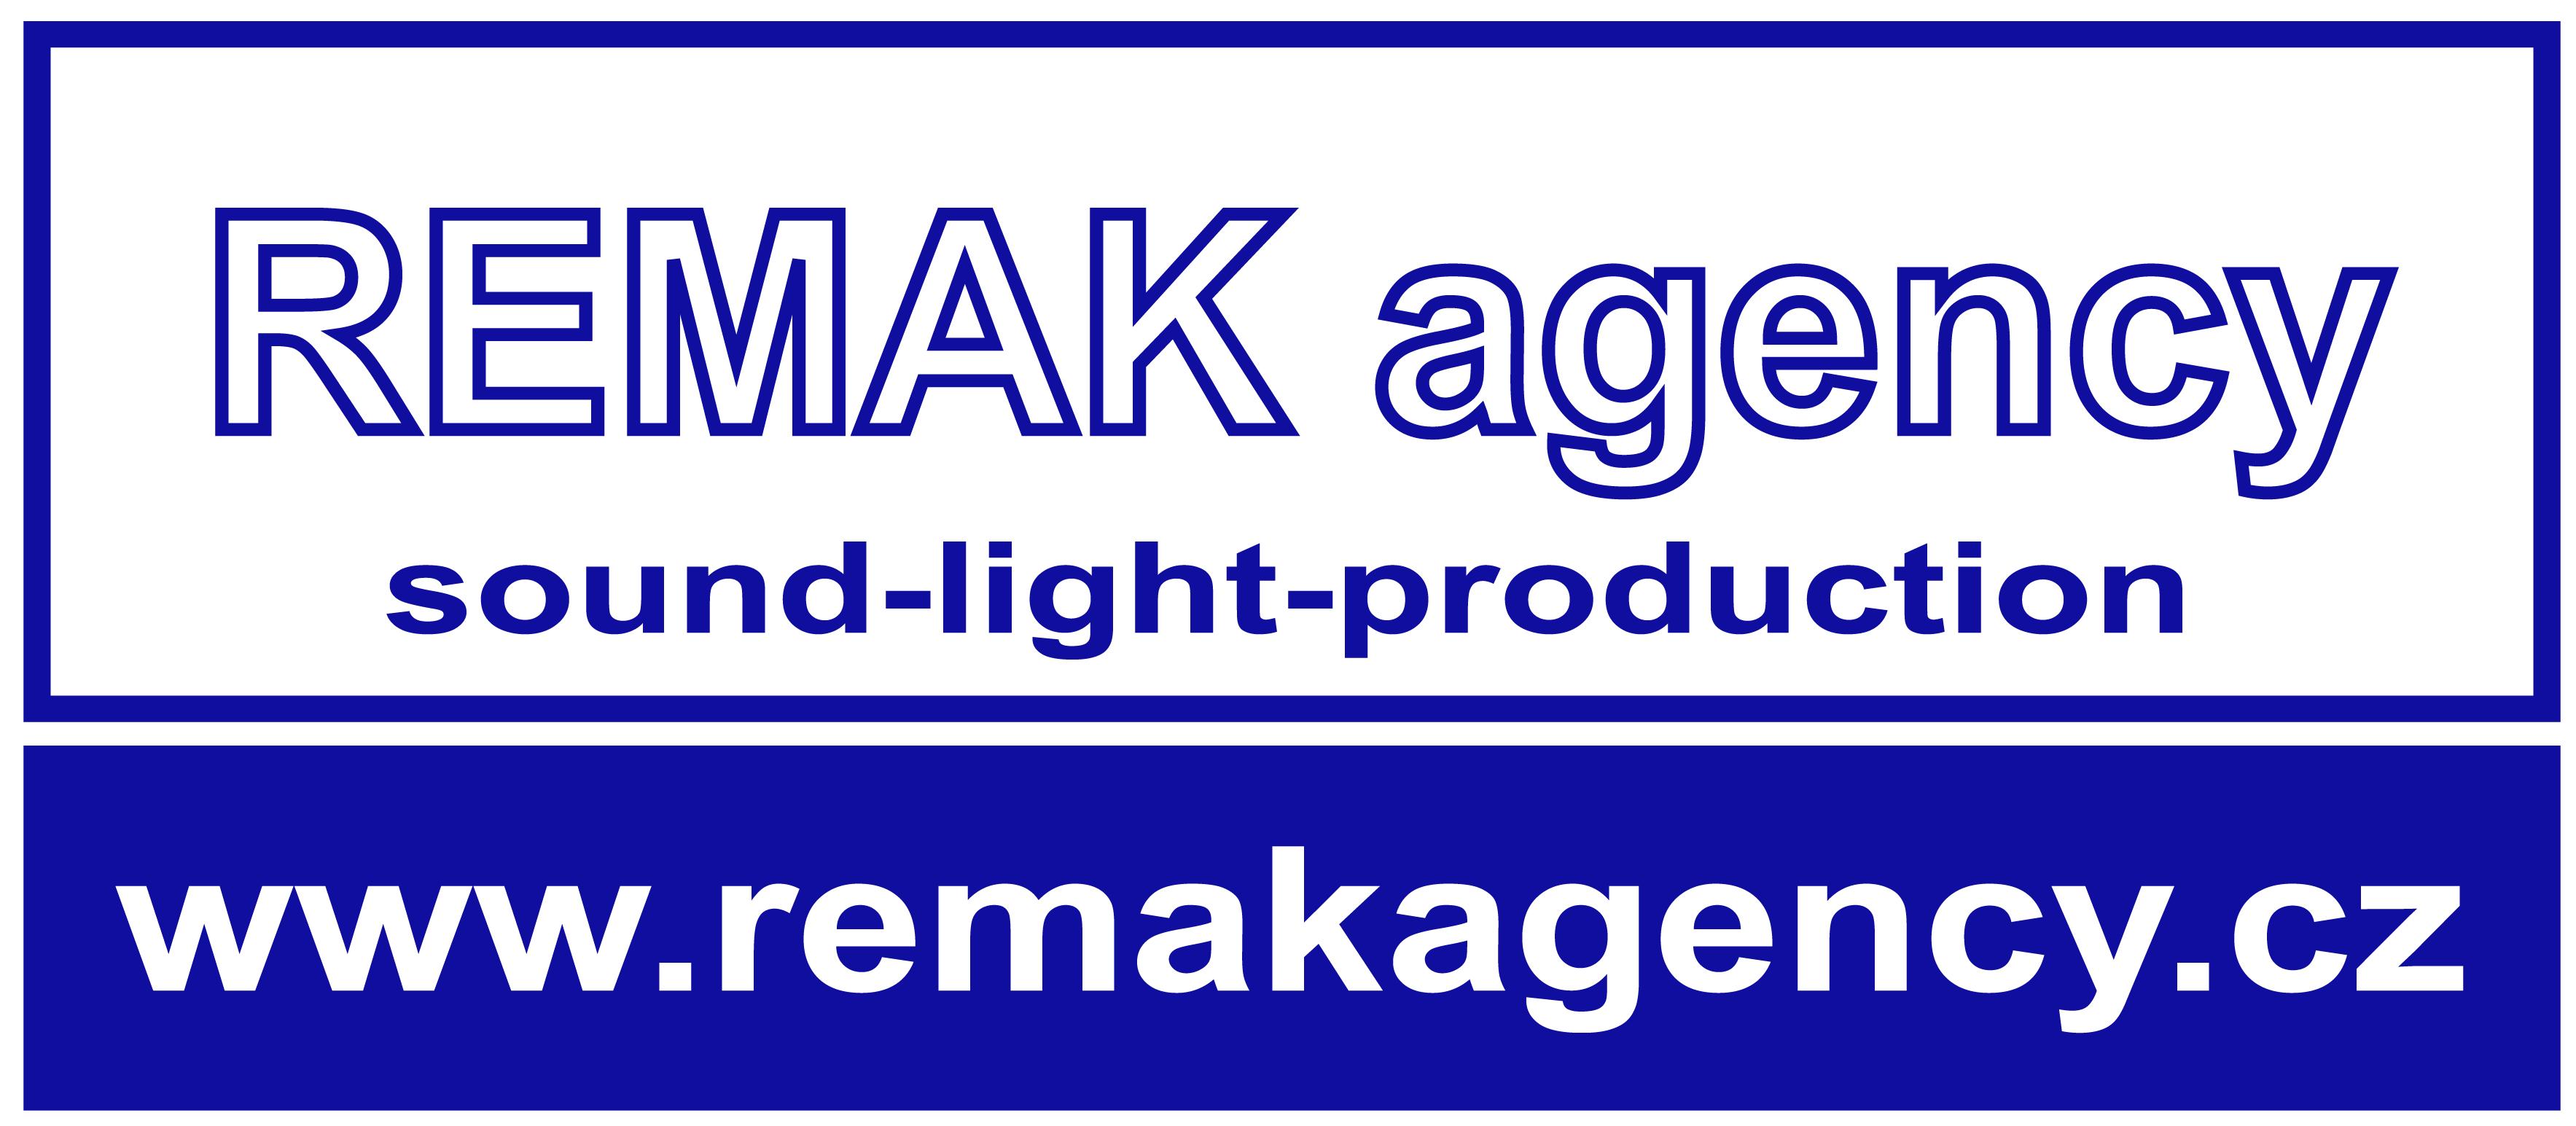 REMAK agency